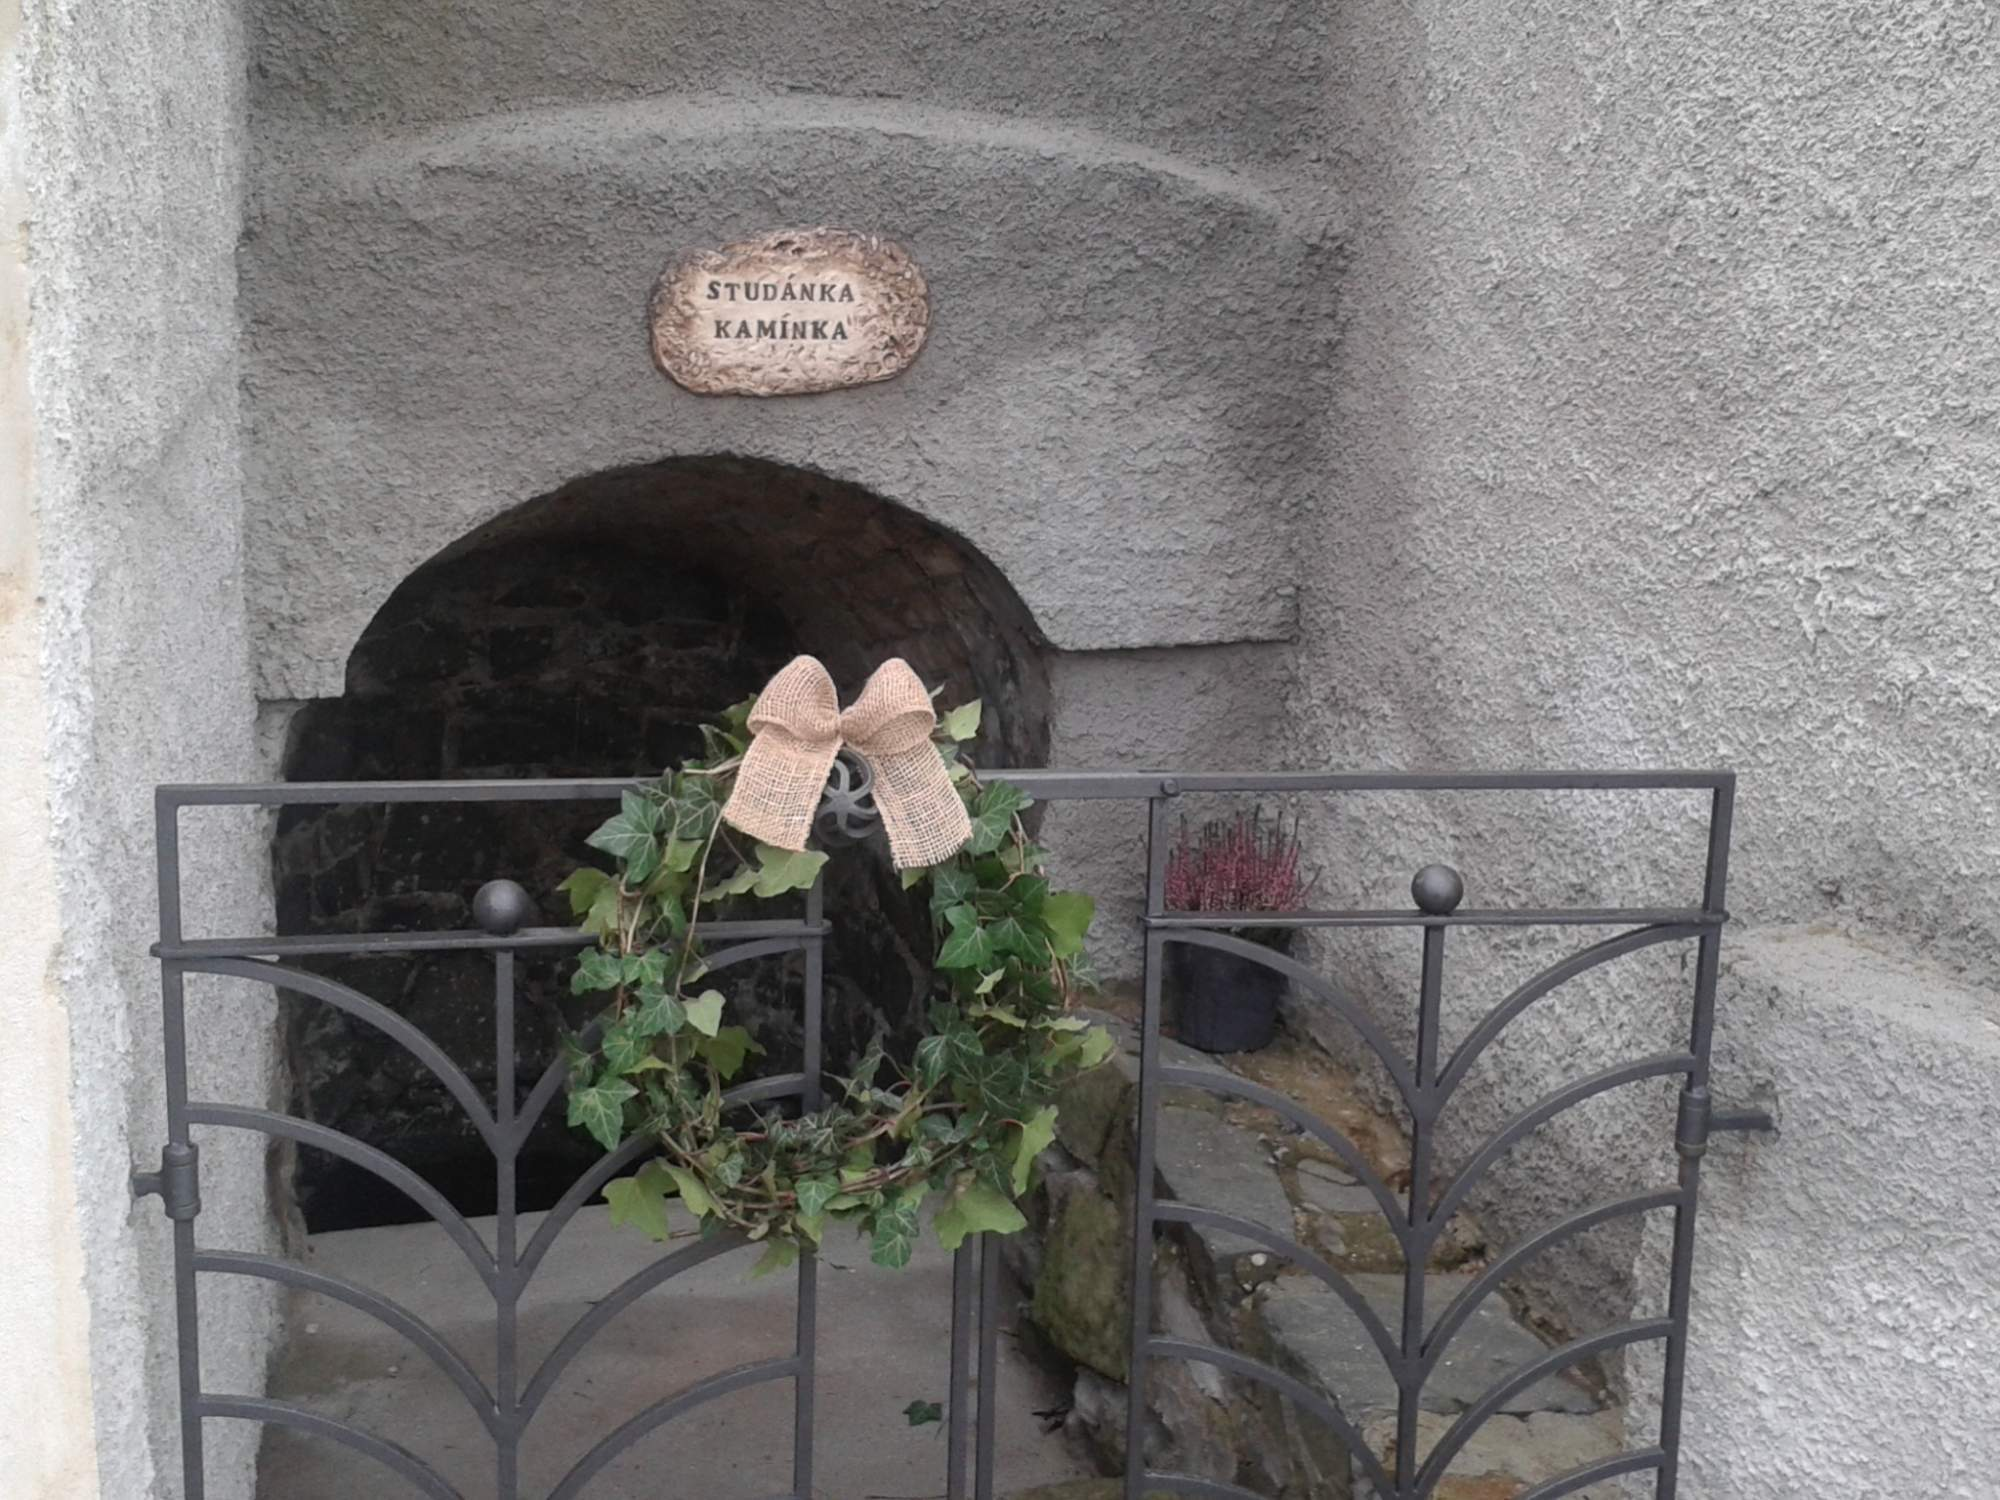 Studánka Kamínka, Praha 5 - Zbraslav